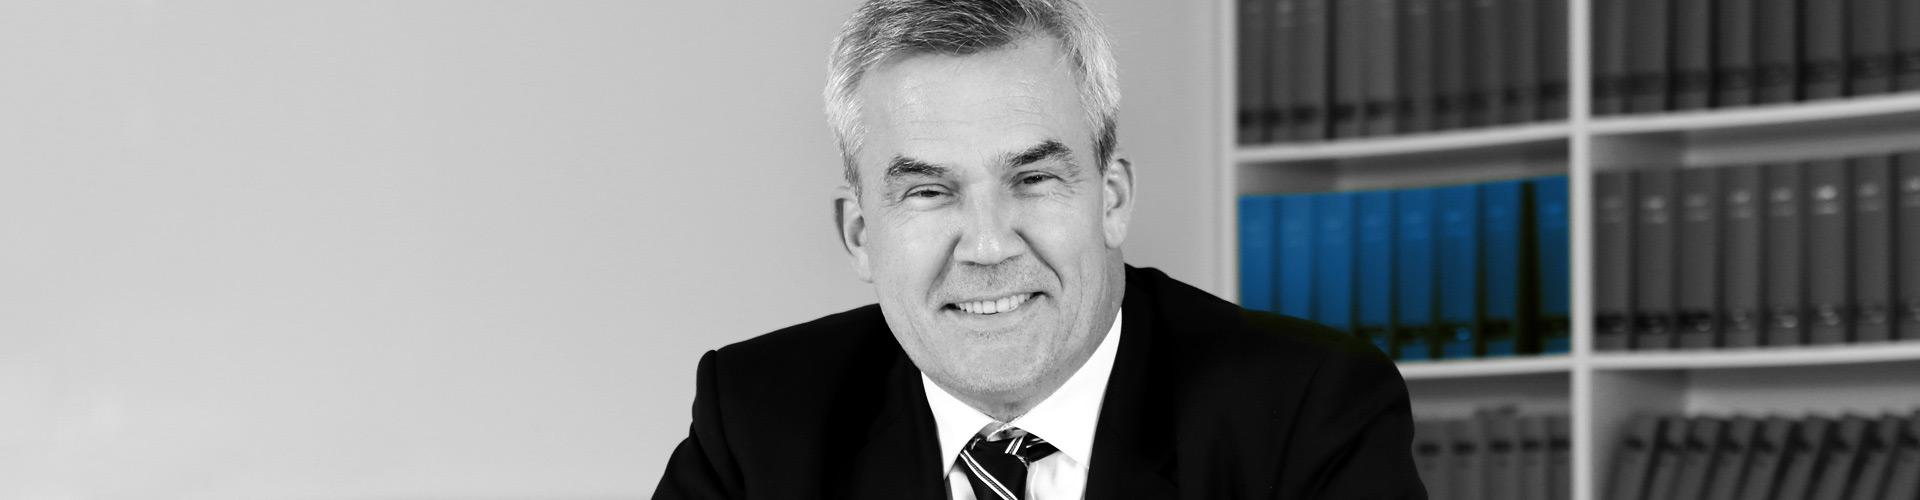 Michael Struckhoff Rechtsanwalt München